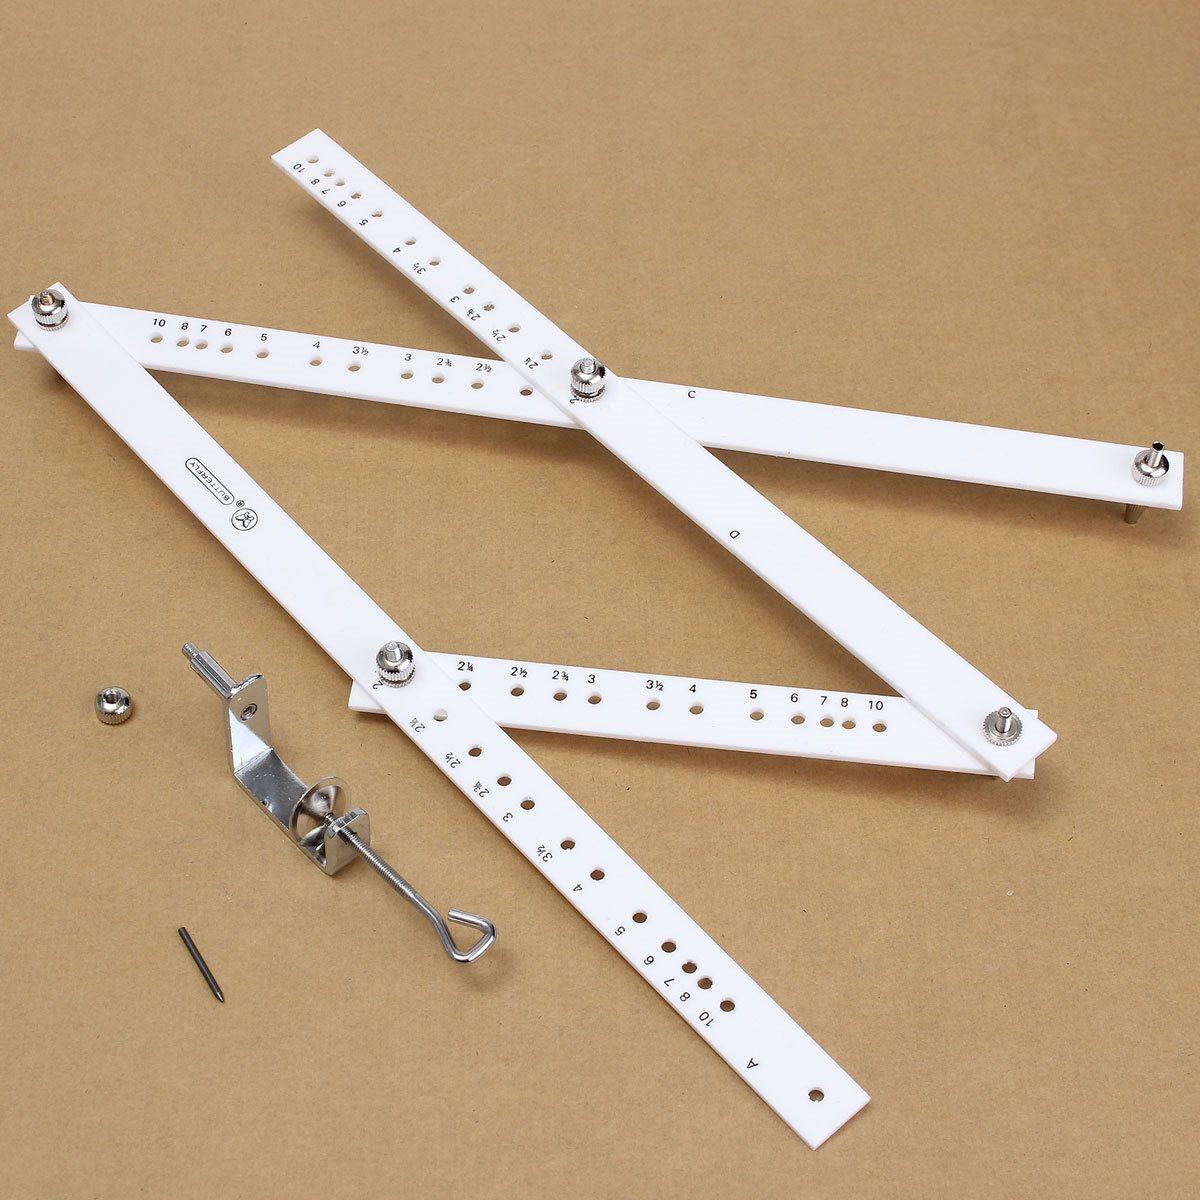 Kicute 34cm Scale Drawing Ruler Artist Pantograph Folding Ruler Reducer Enlarger Tool Art Craft For Office School Supplies